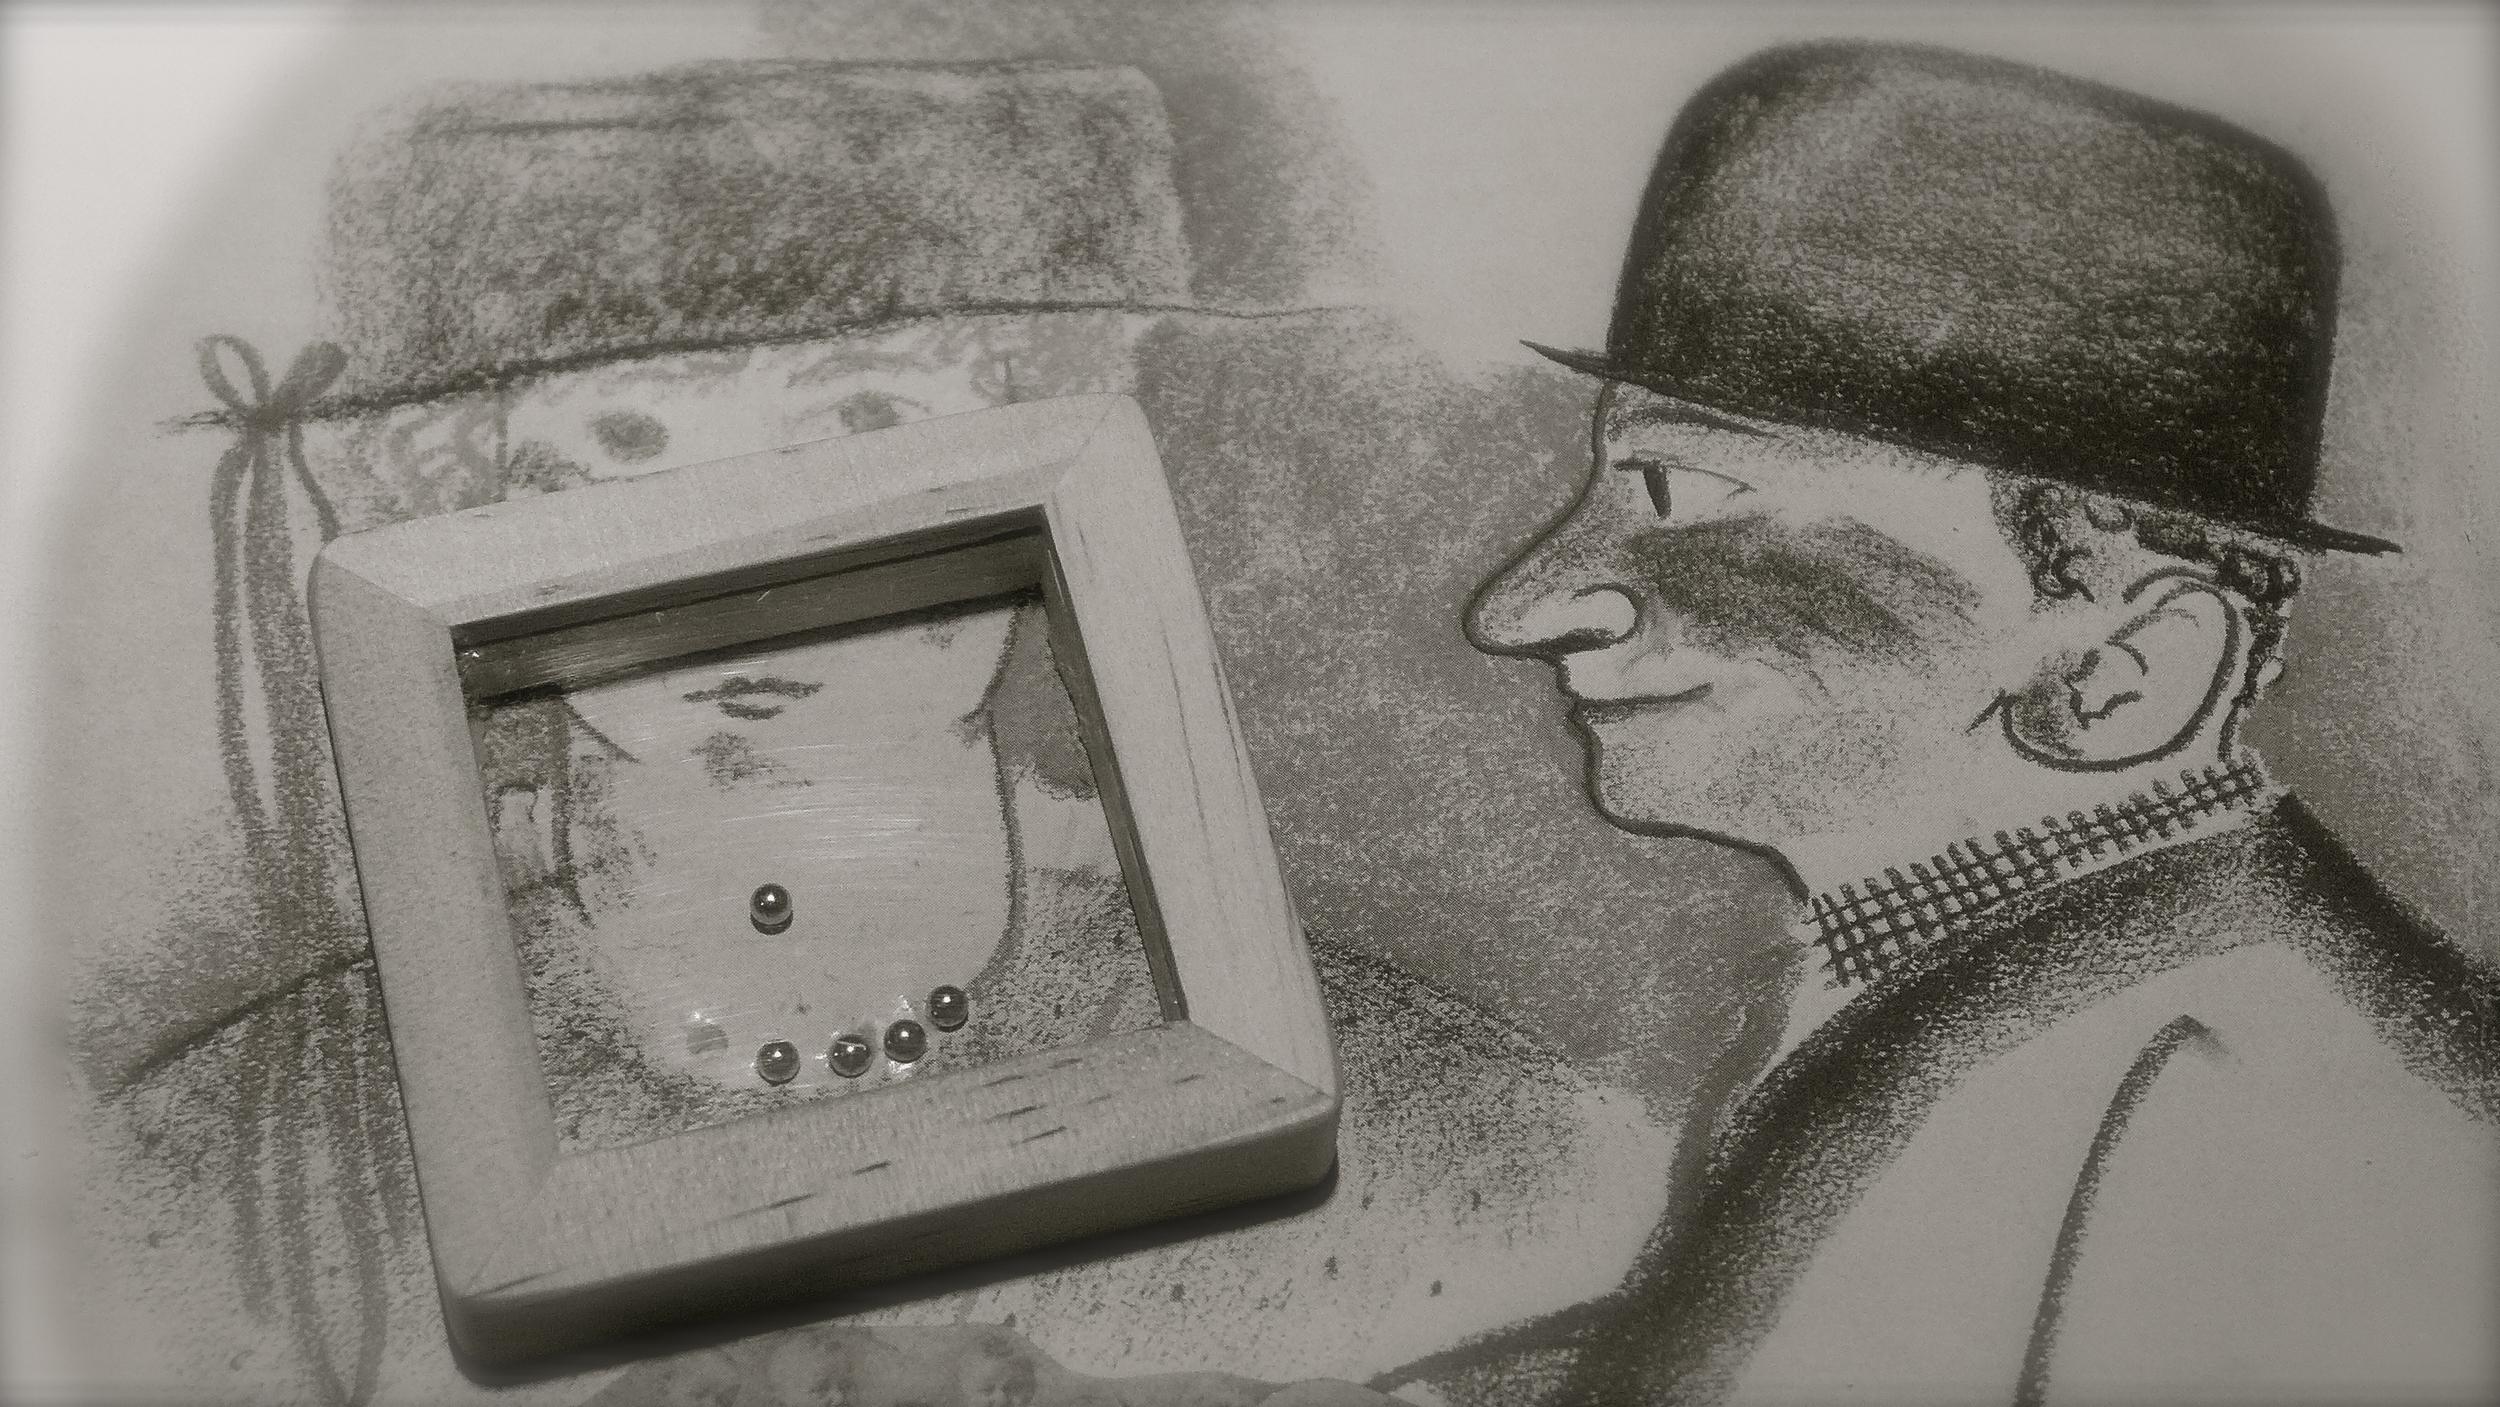 Oscarin sombreros Blumenfeld - 2